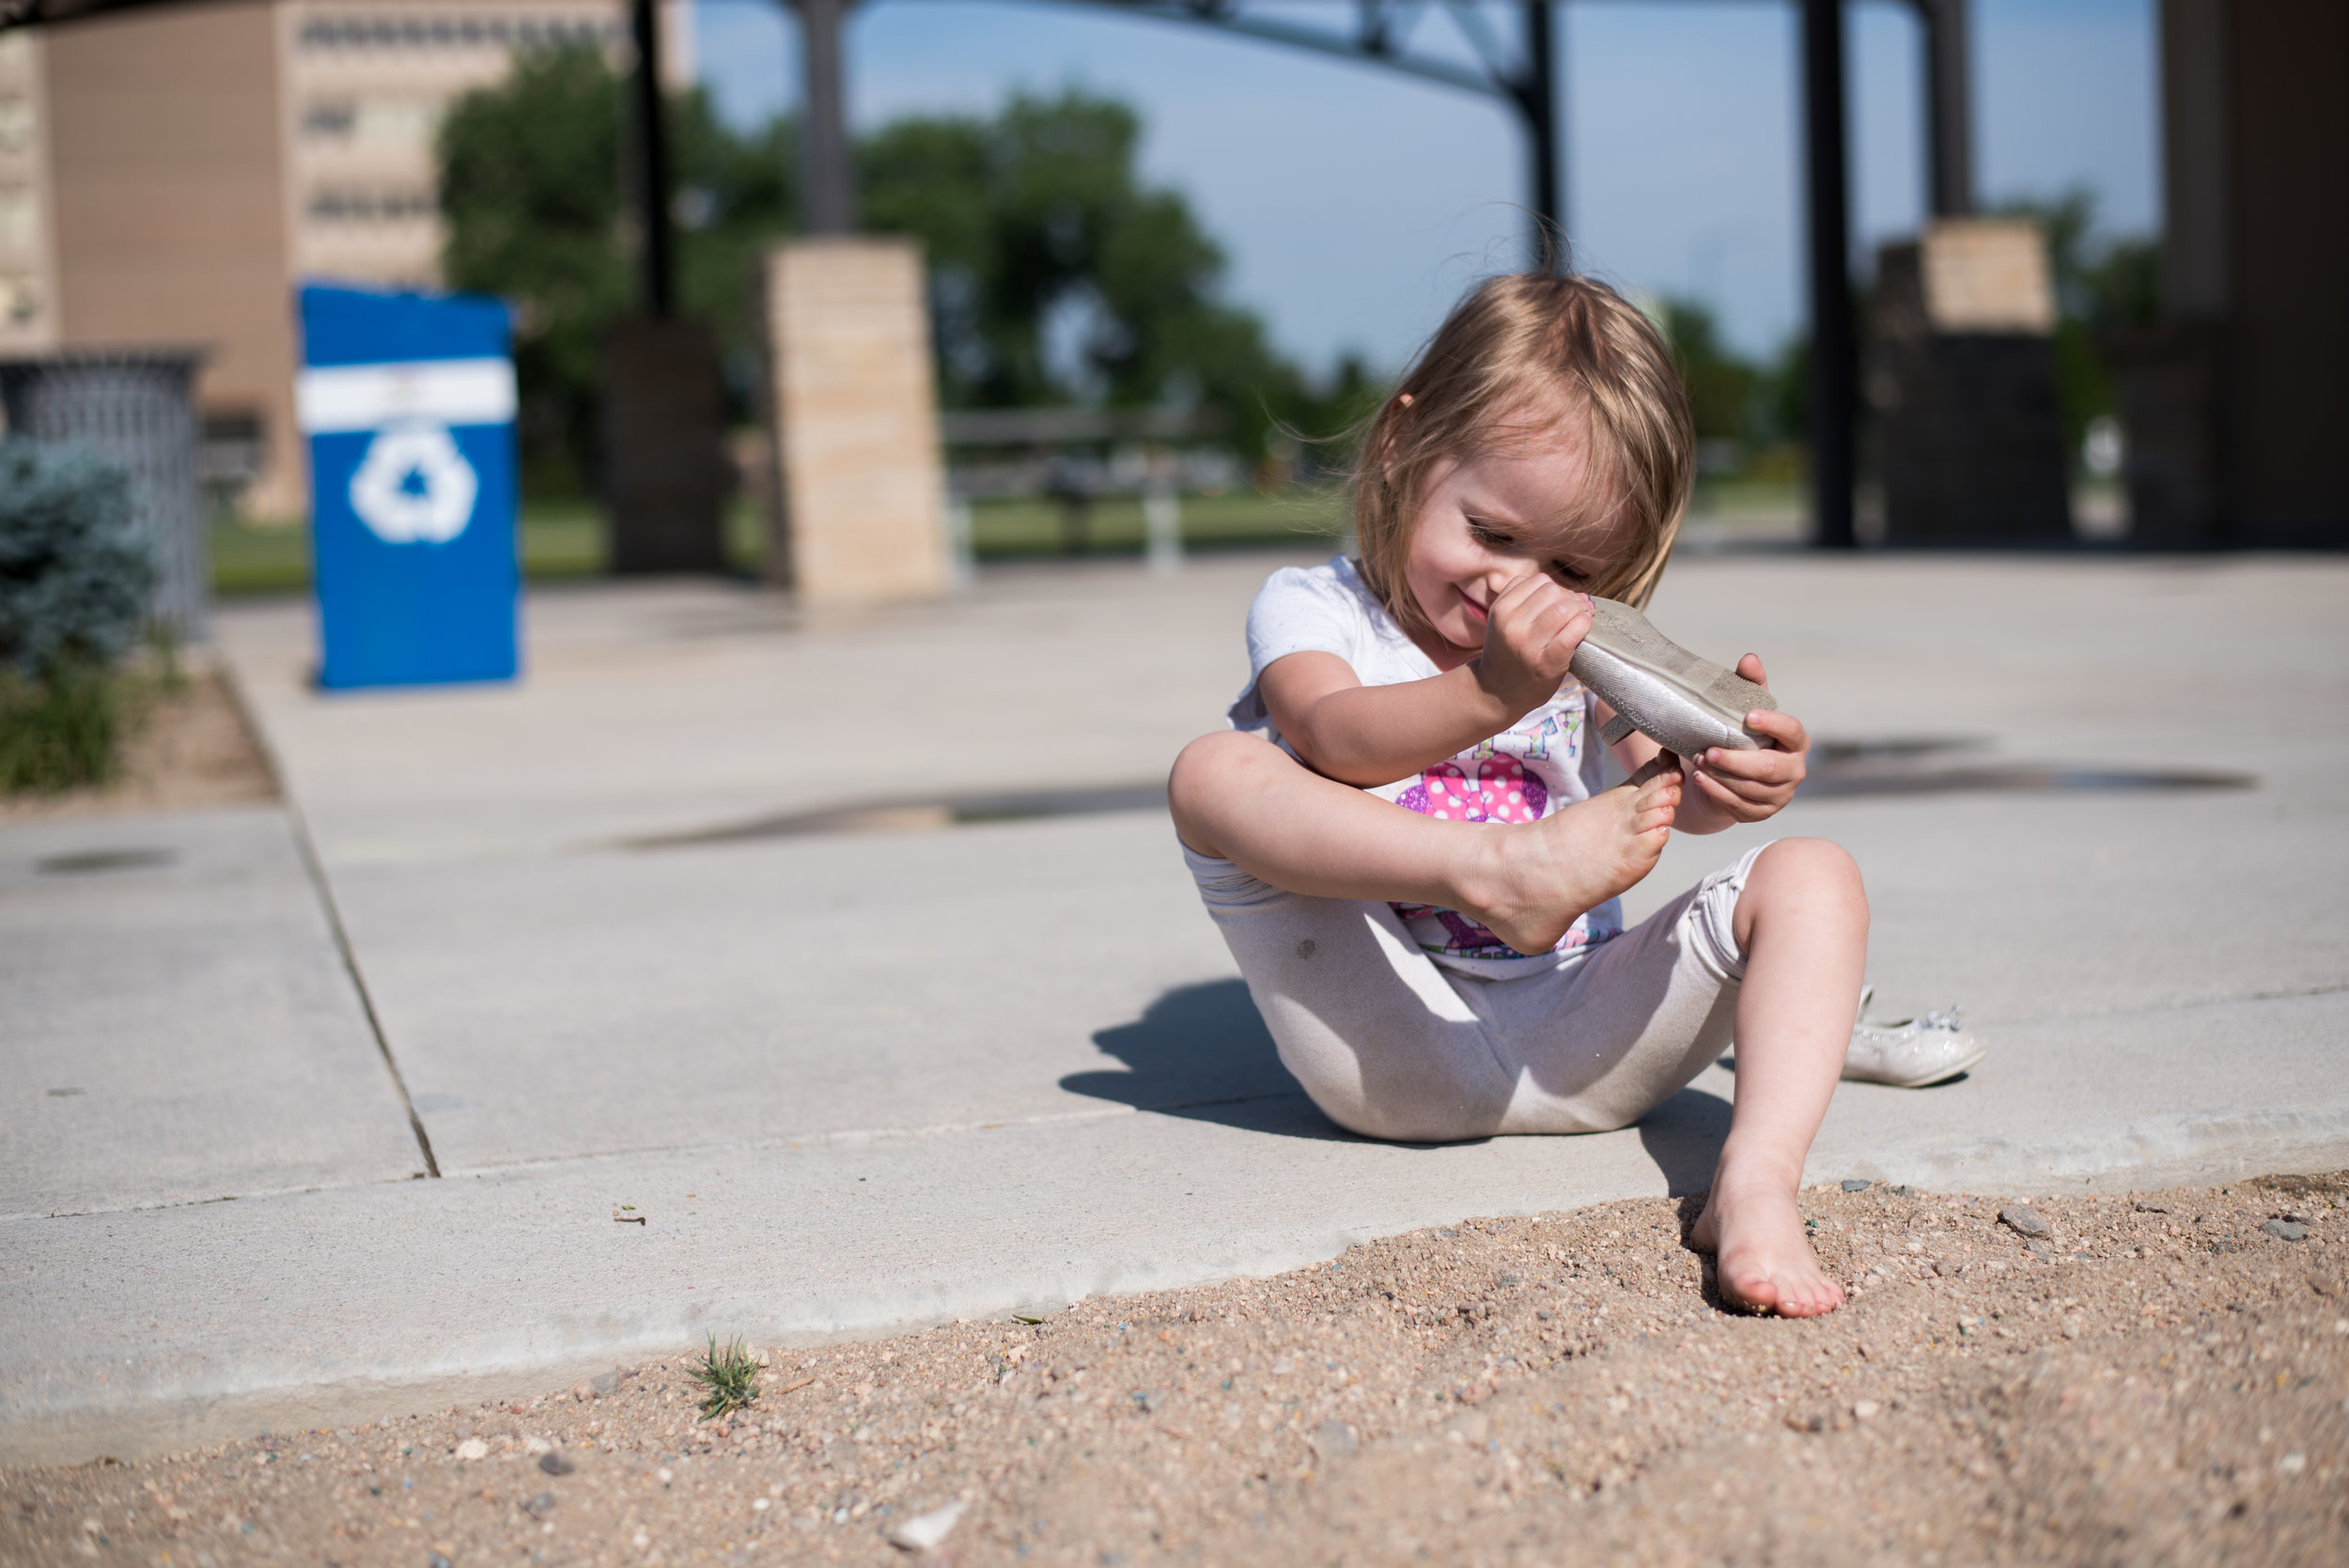 artistic park photo, play, the playground diaries